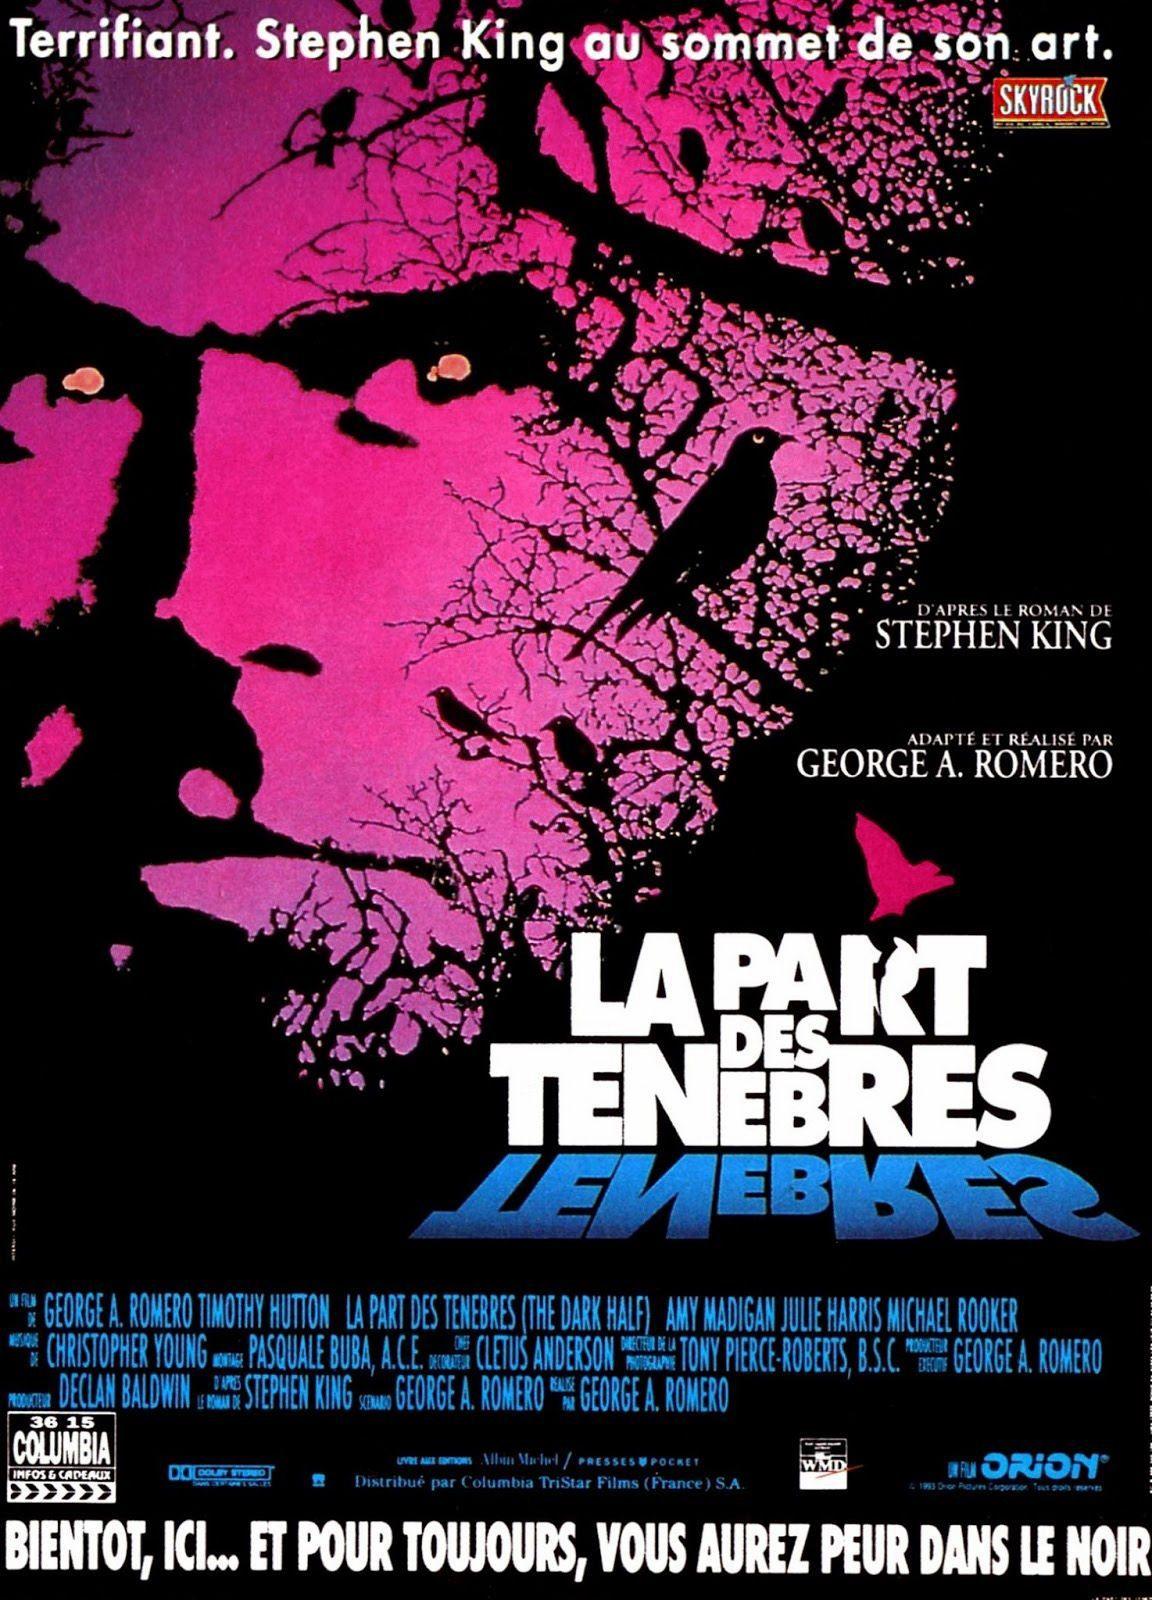 La_Part_des_tenebres